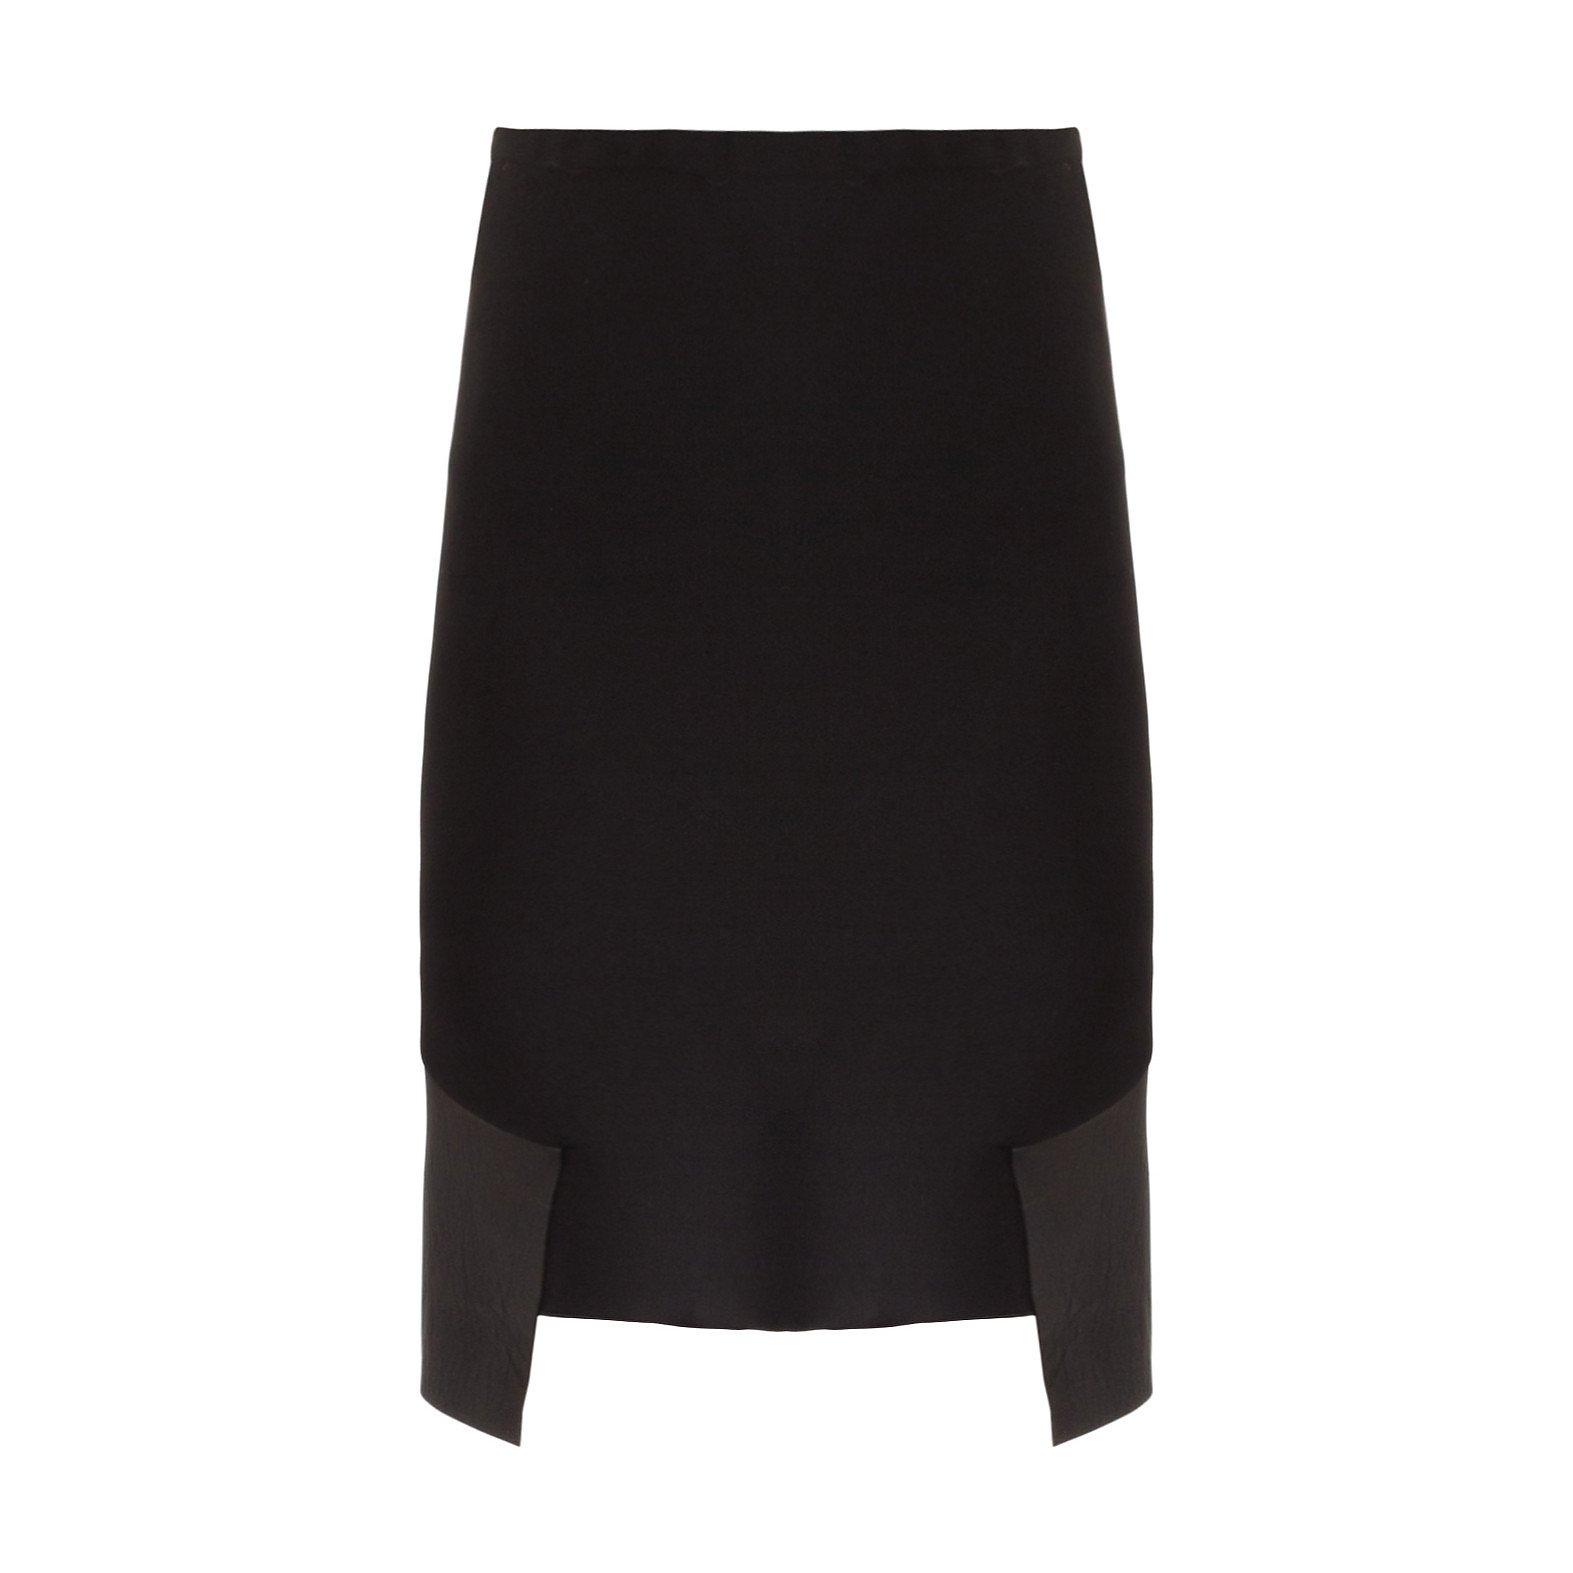 Dion Lee Leather-Trimmed Skirt